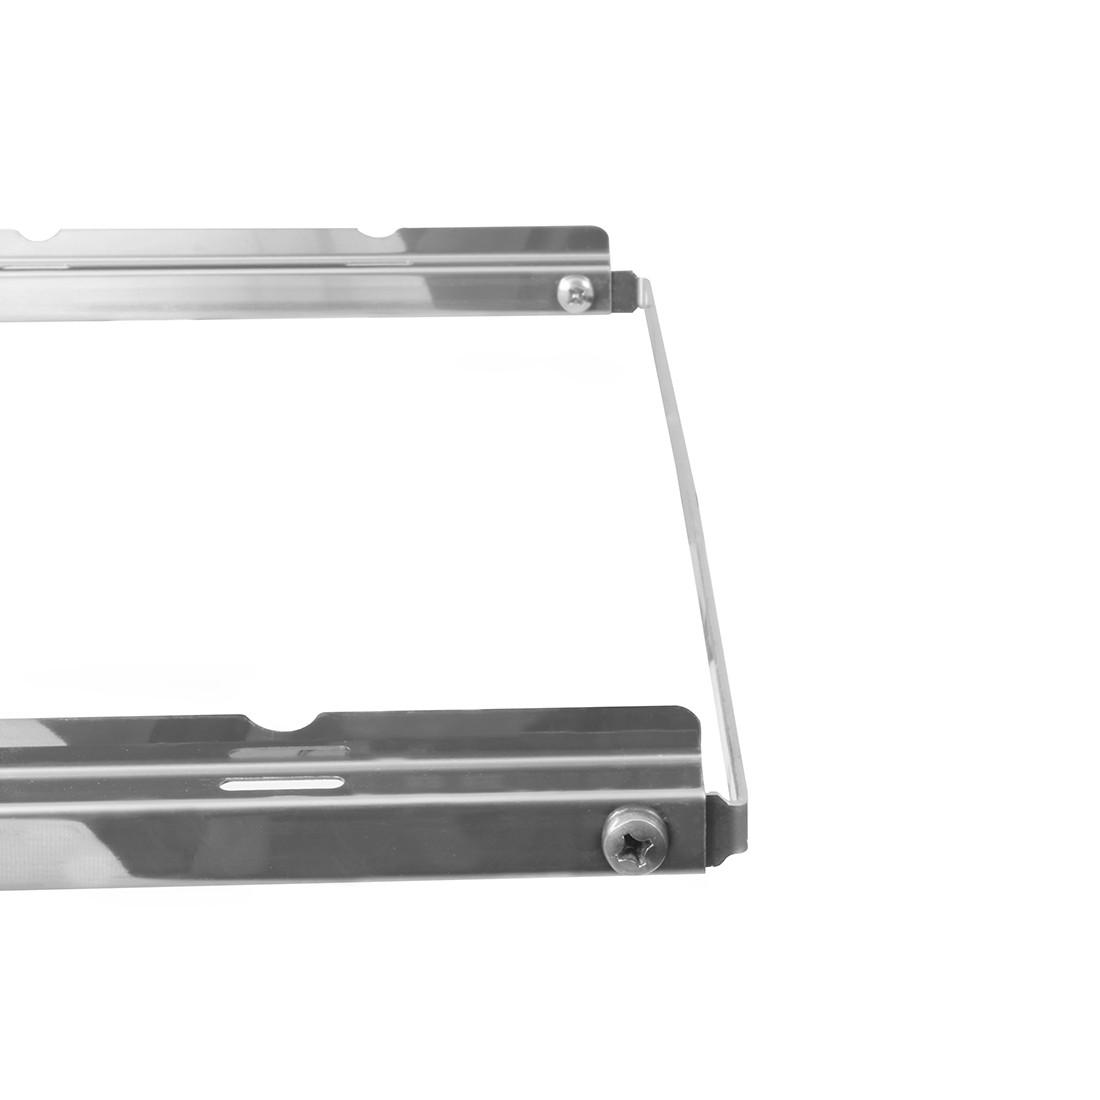 Giragrill Kit Suporte PM-4 Inox